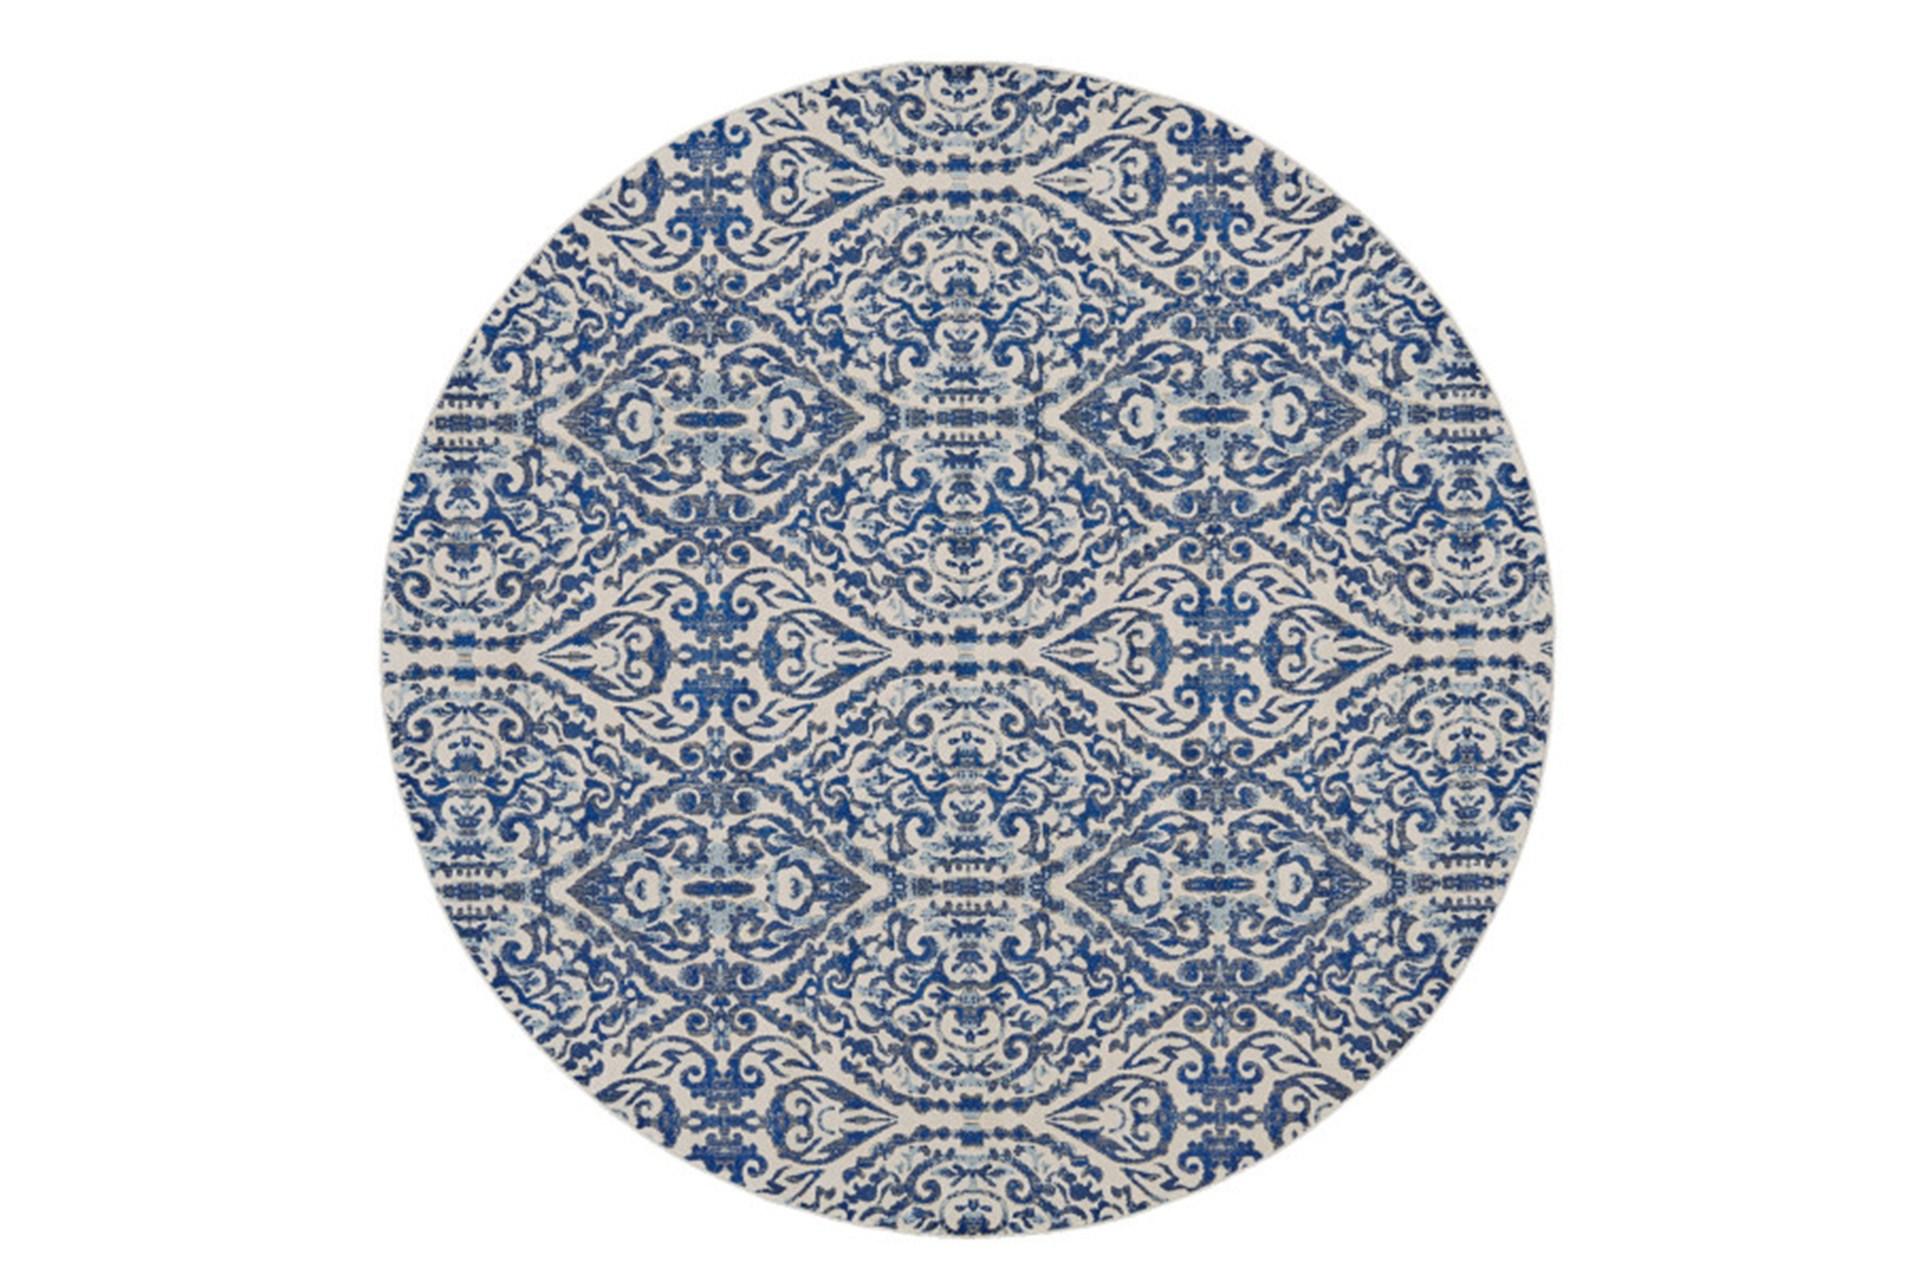 105 Inch Round Rug Royal Blue Distressed Damask Living